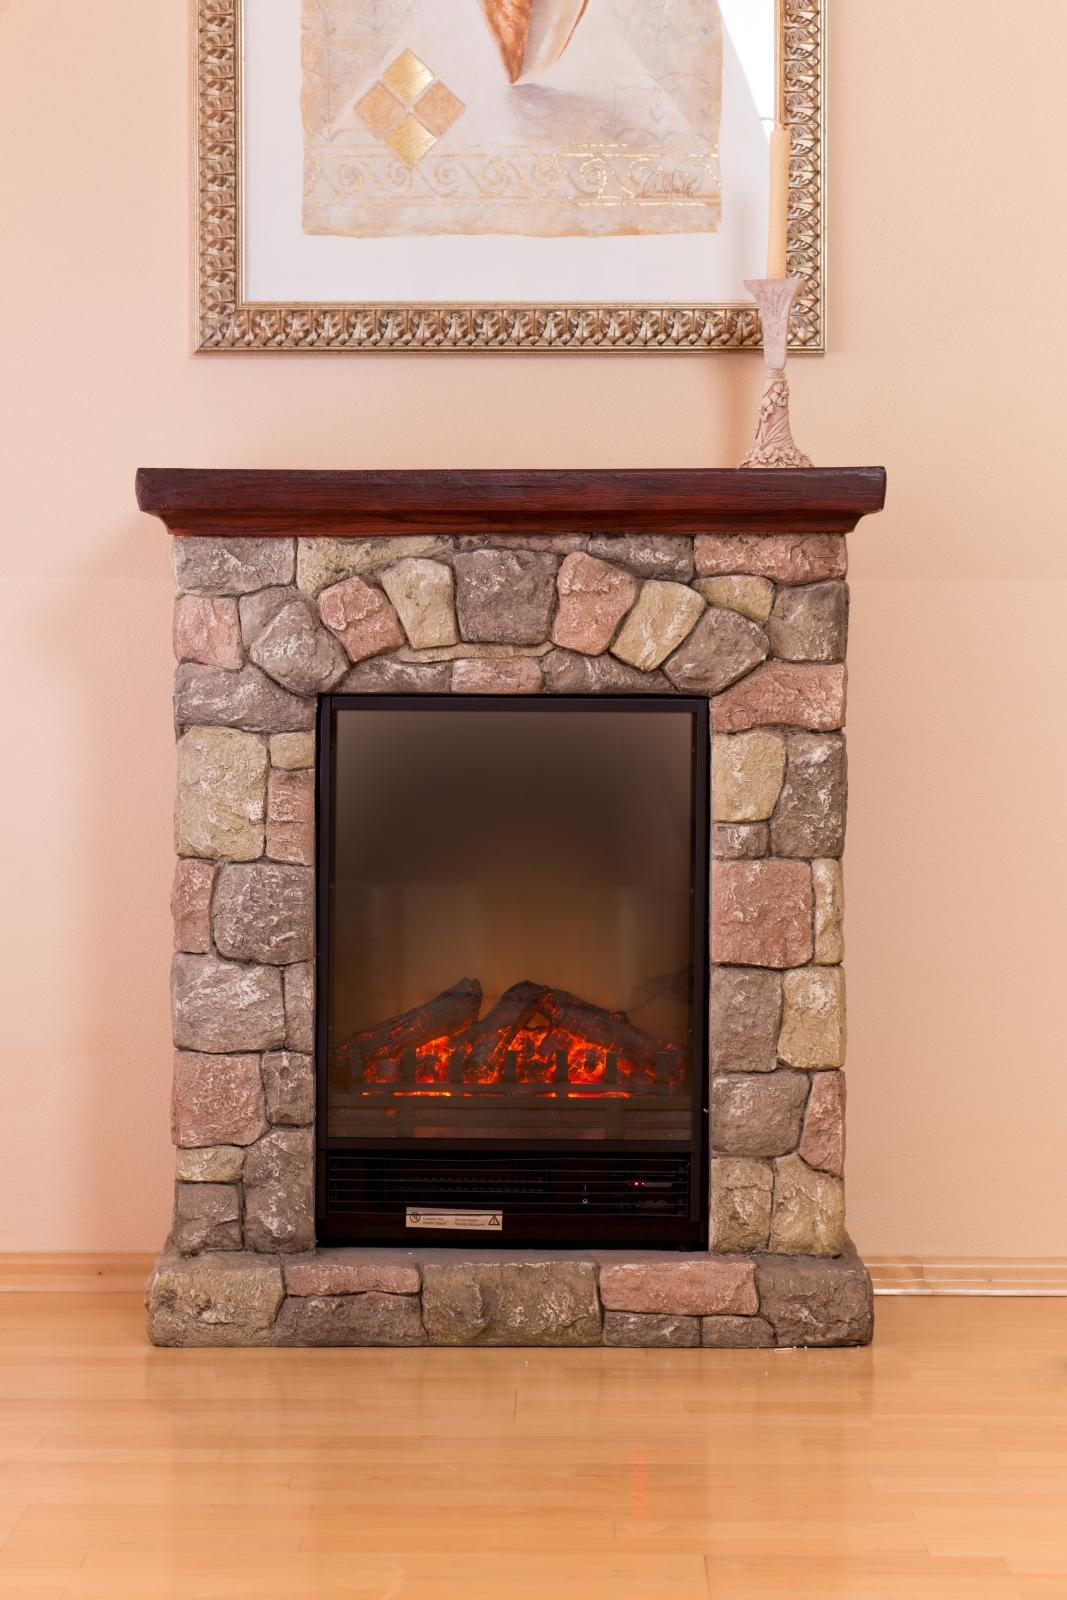 el fuego elektrokamin lugano ay608 heizung ofen kamin 750 1500 watt mit fb neu haus garage. Black Bedroom Furniture Sets. Home Design Ideas